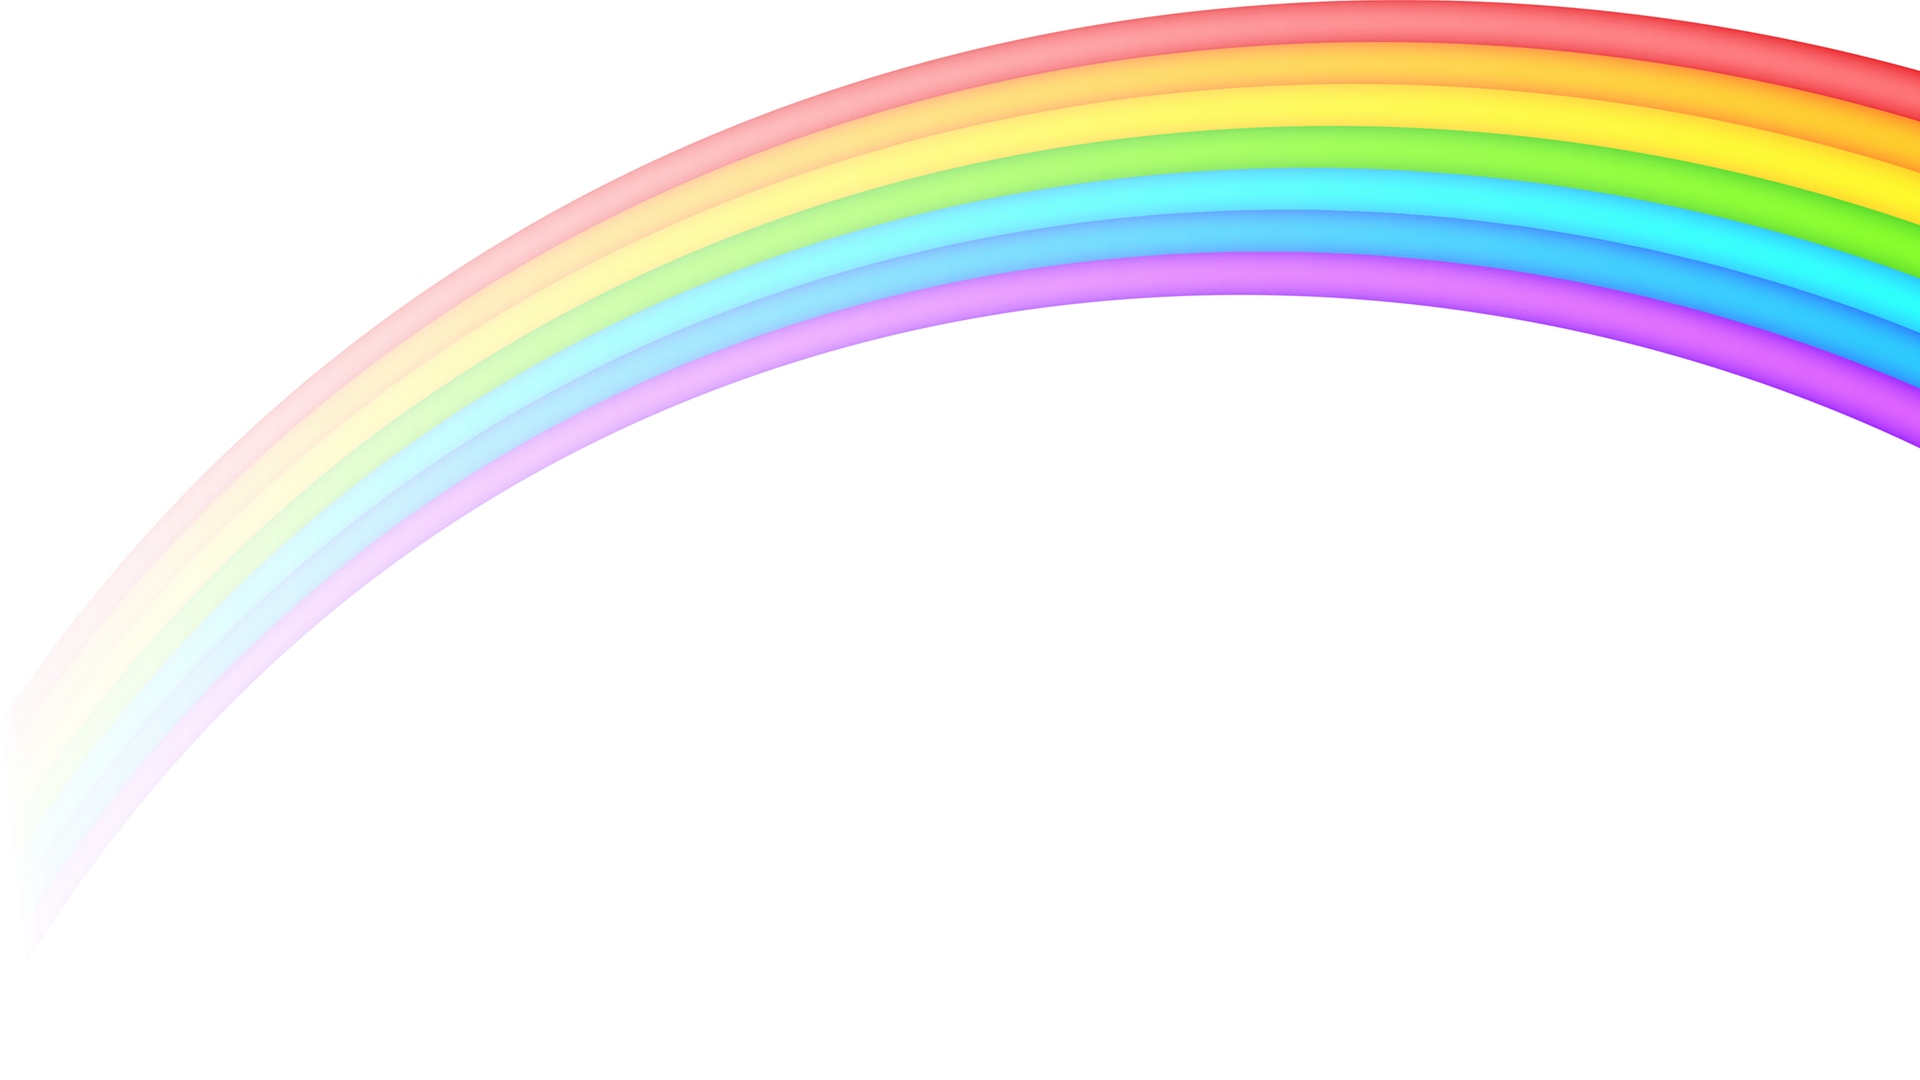 Rainbow PNG Transparent Images, Pictures, Photos.